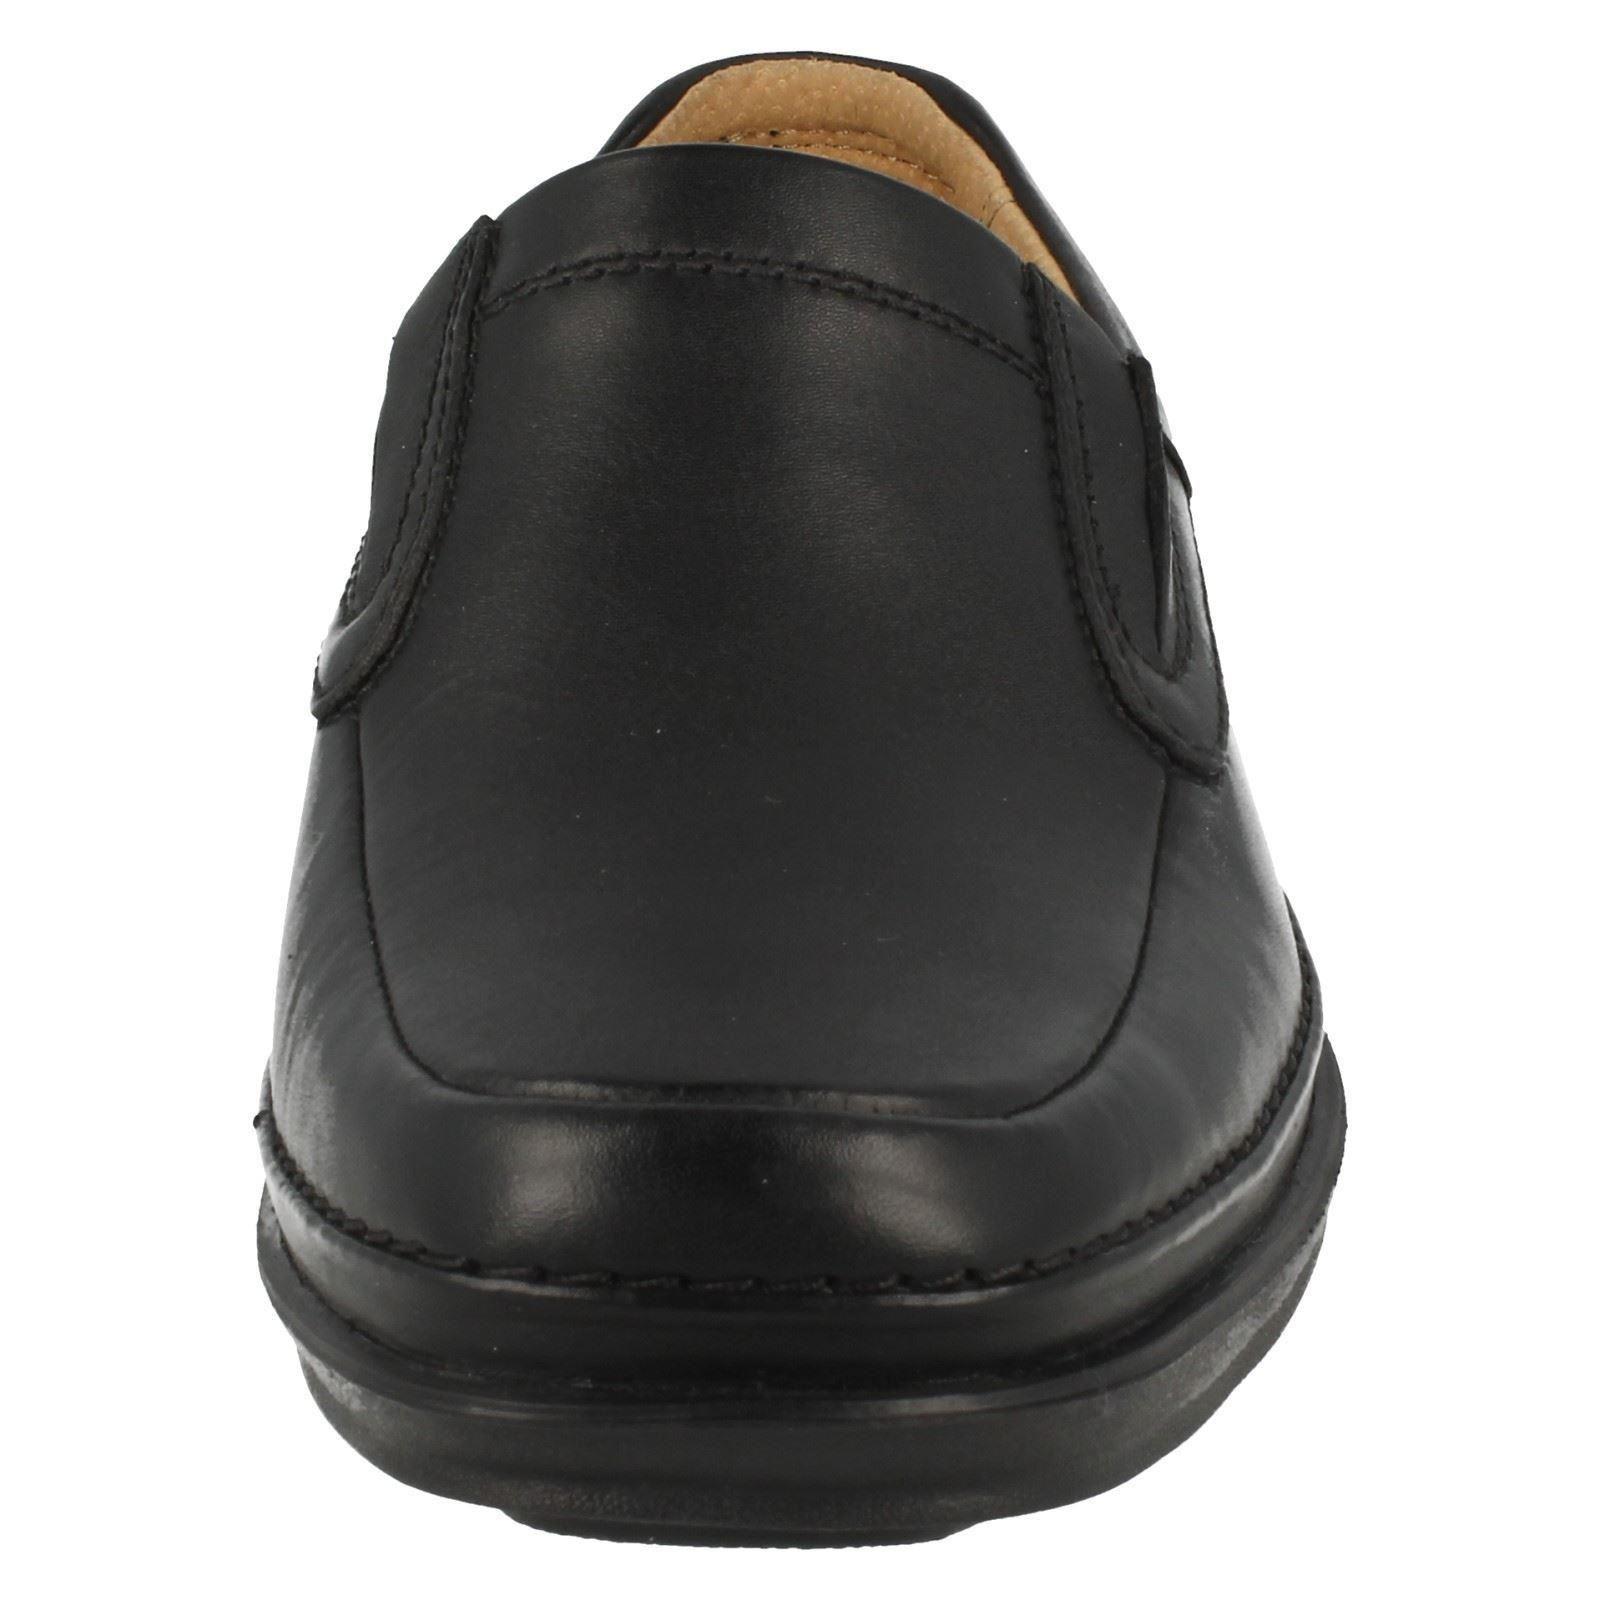 Herren Clarks On Wide Slip On Clarks Schuhes 'Scopic Step' d4373f